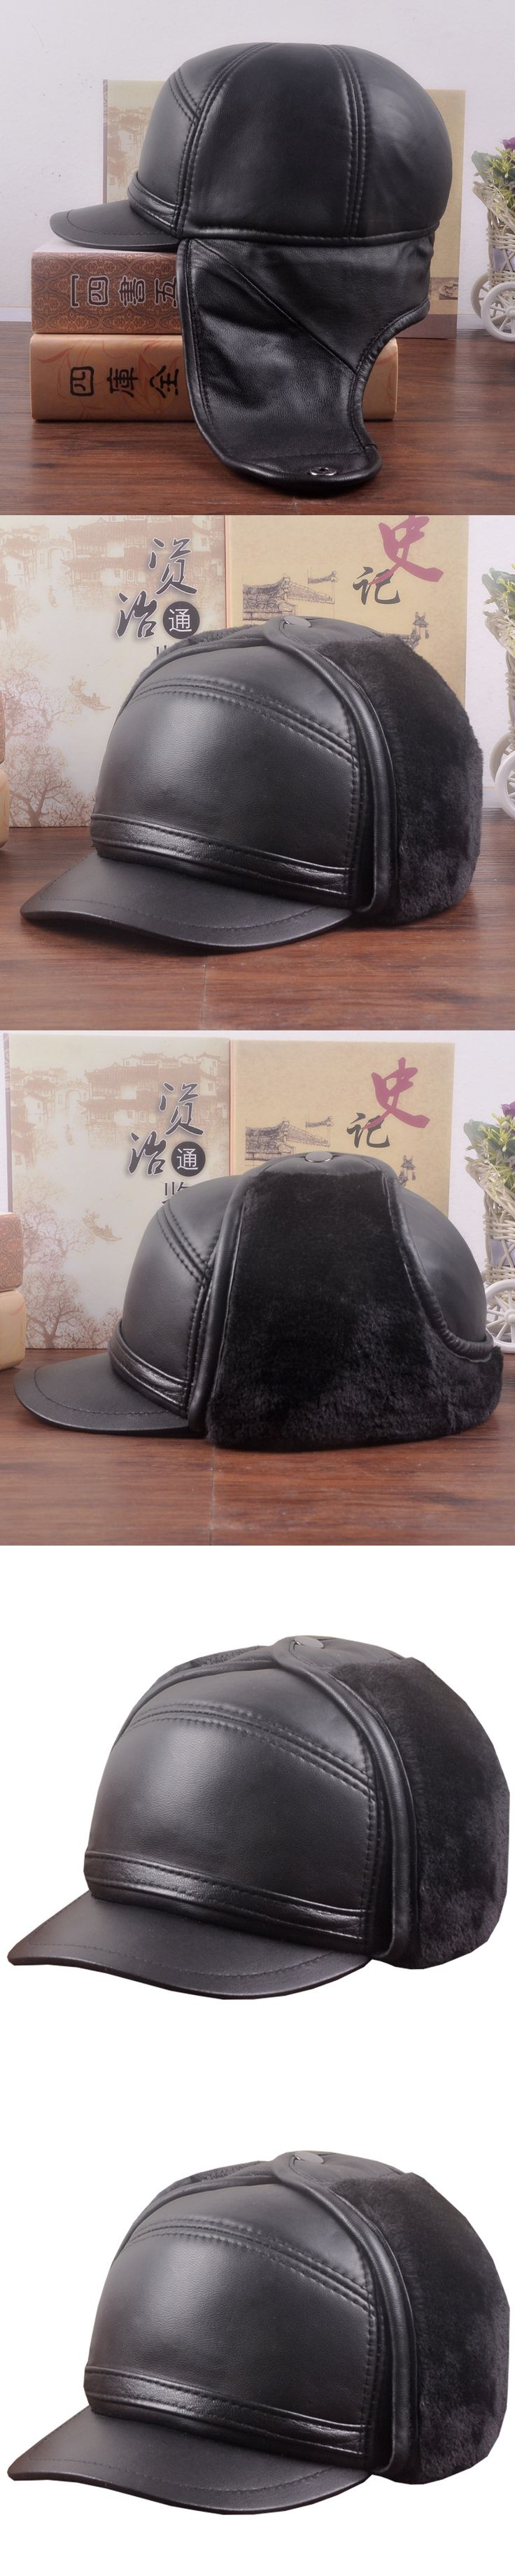 New Leather Hat Adult Winter Warm Sheepskin Cap Male Imitation Mink Earmuffs Cap Elderly Peaked Cap  New Year Gift B-7273